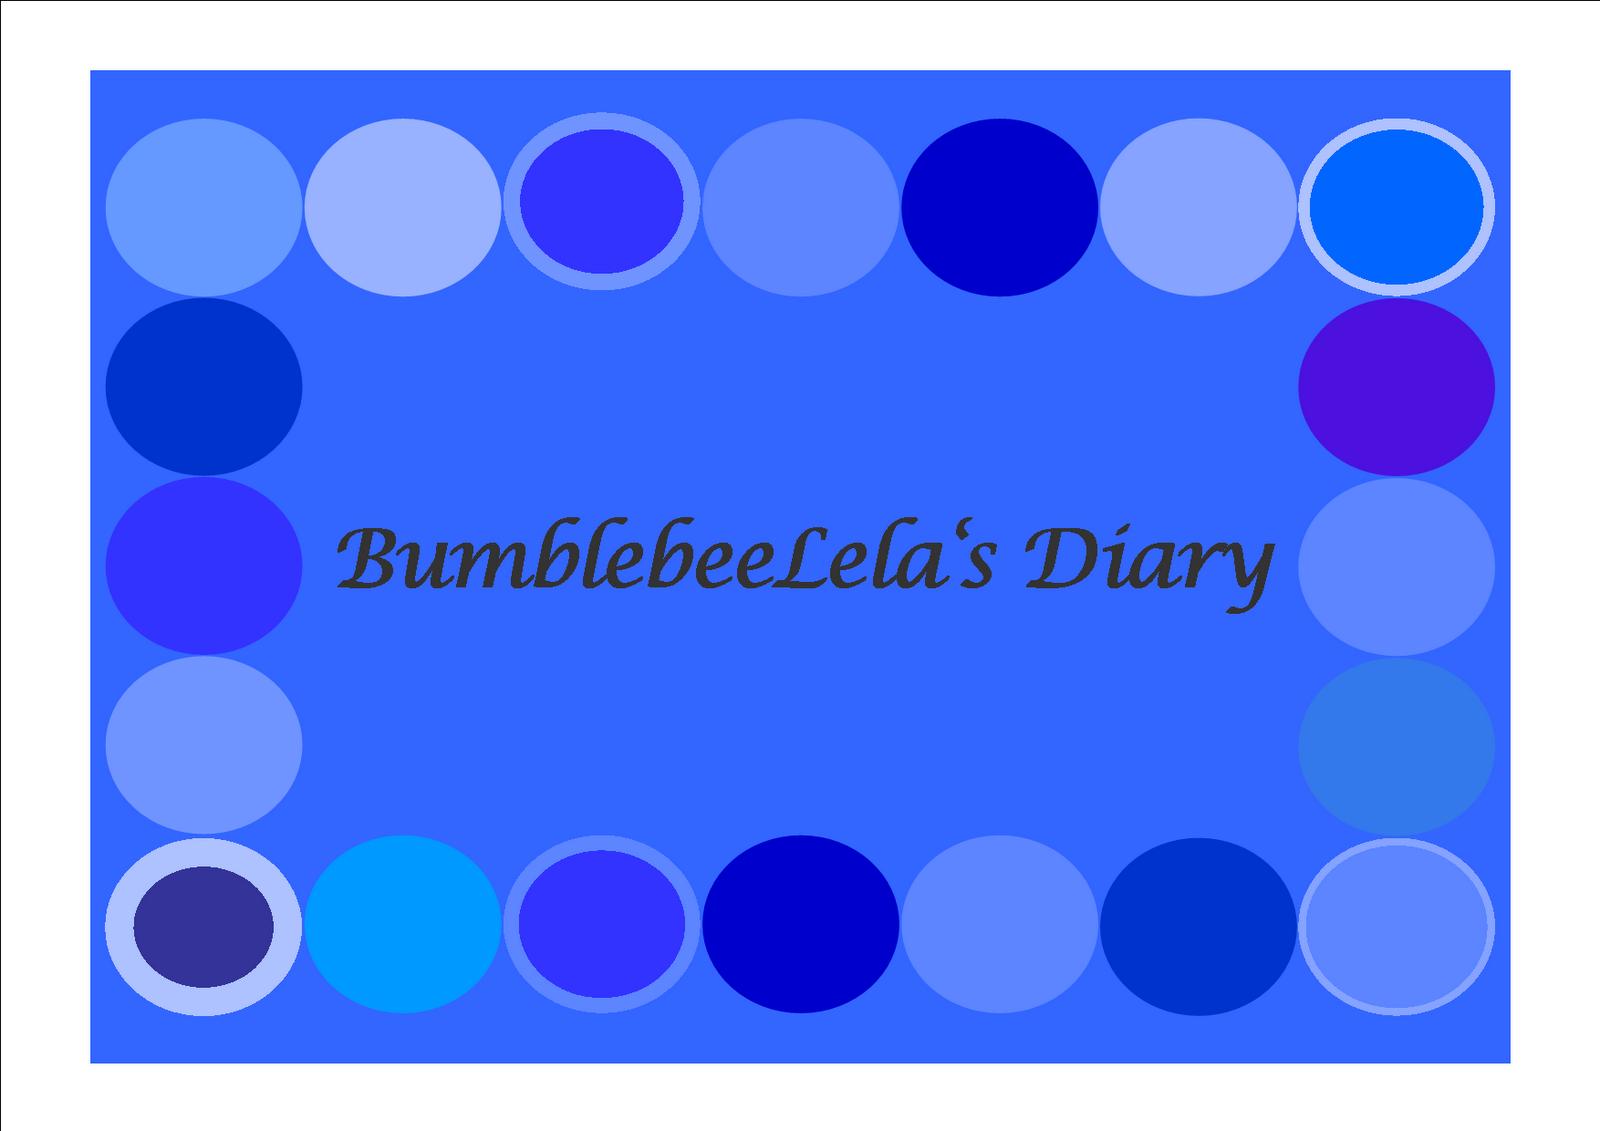 BumblebeeLela's Diary